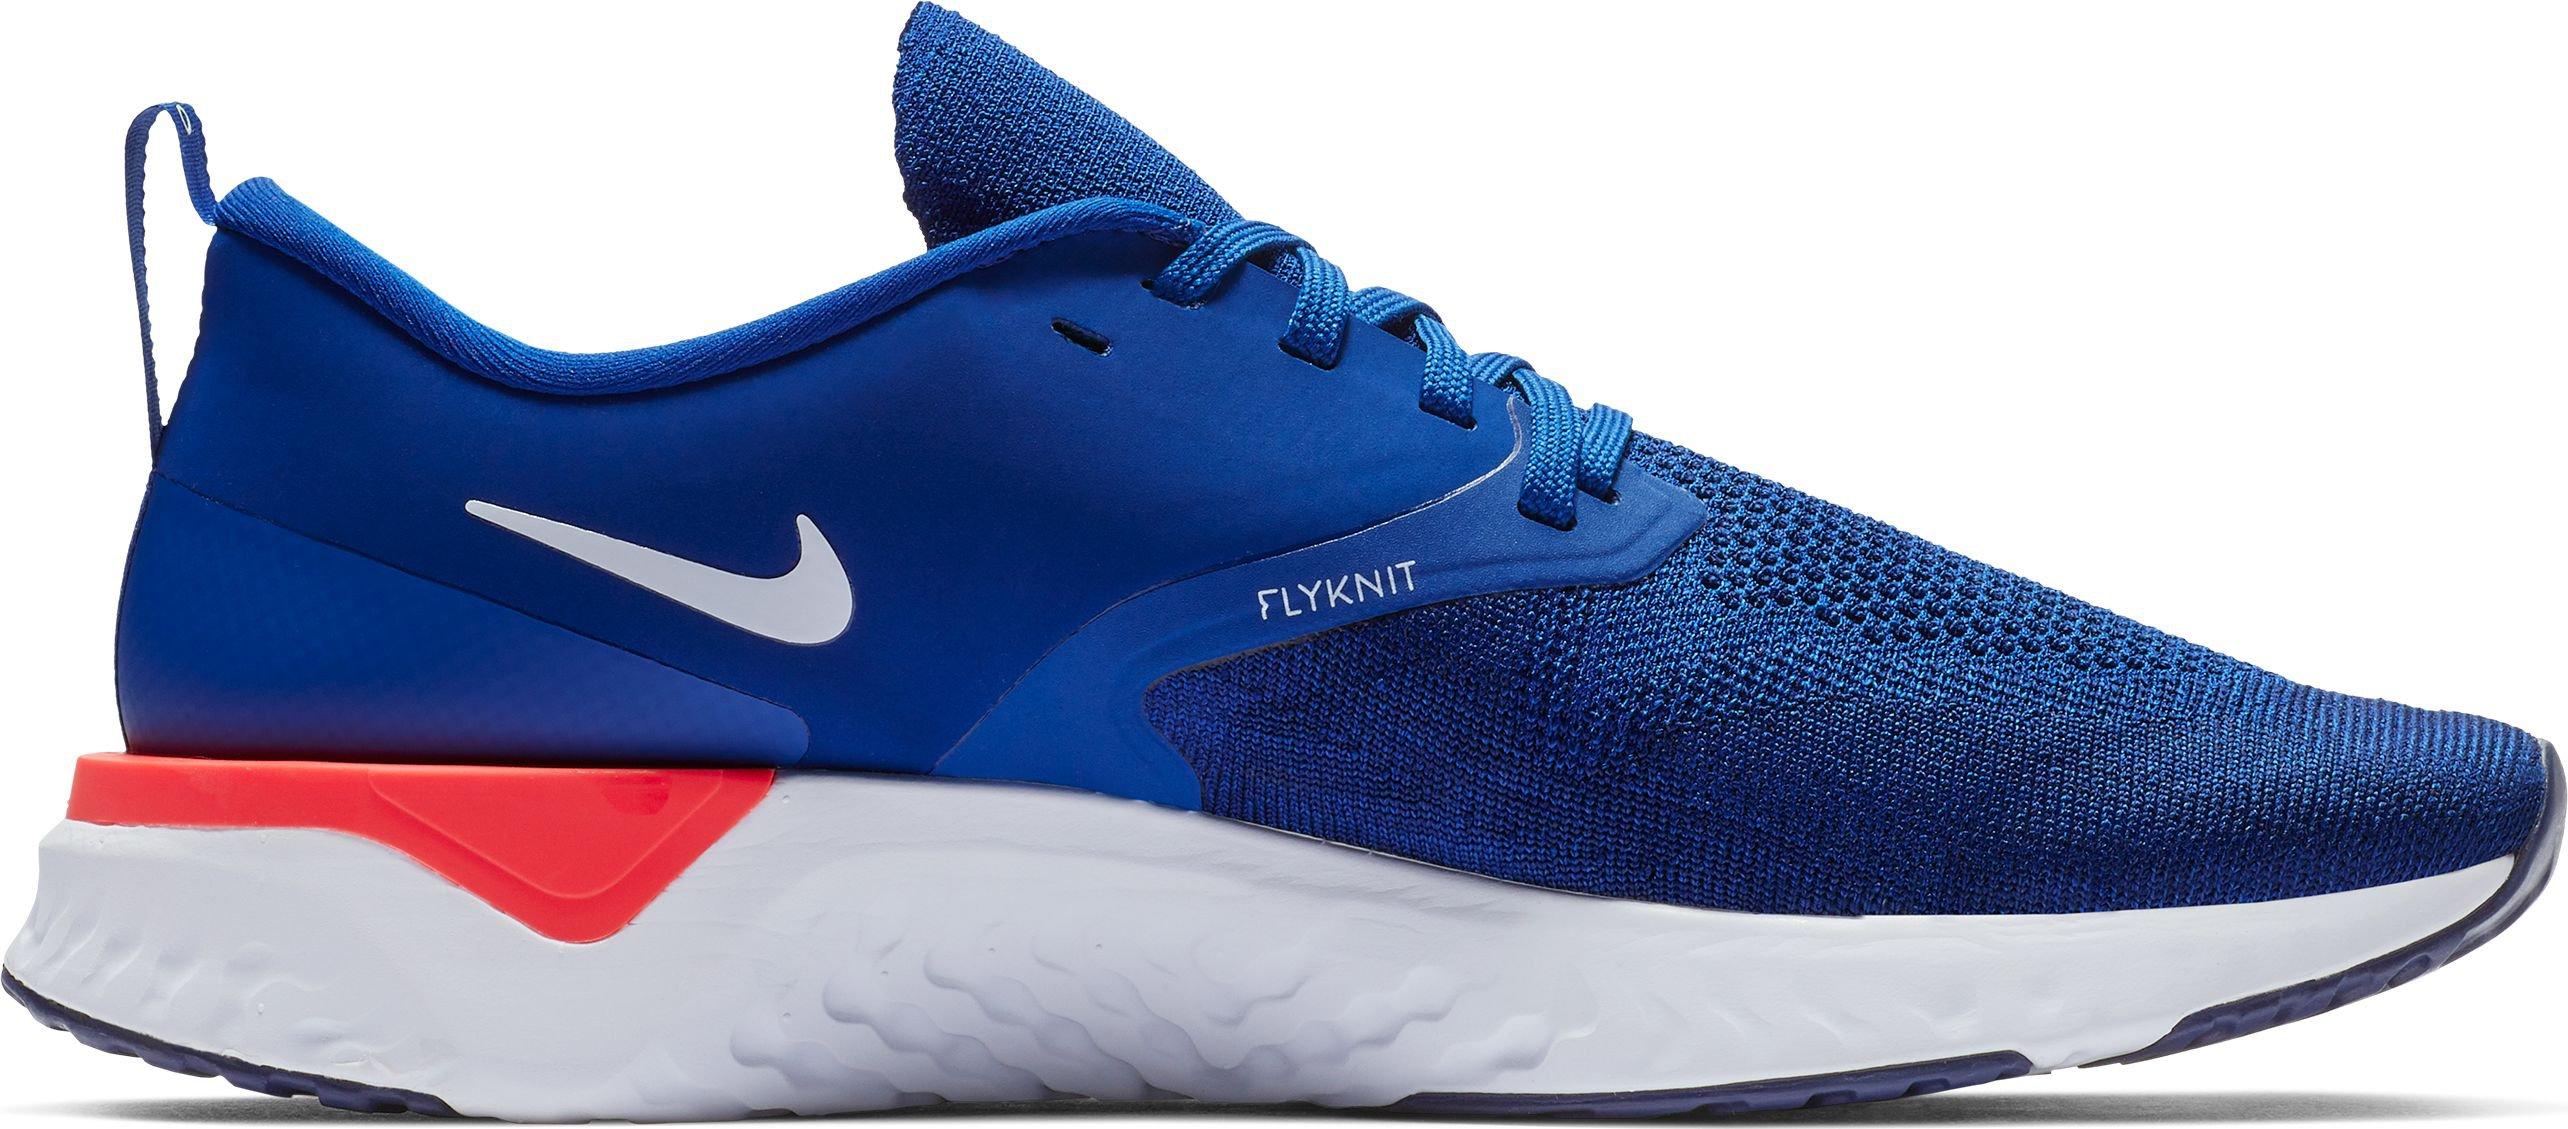 Nike obuv ODDYSSEY REACT 2 force/blue Velikost: 10